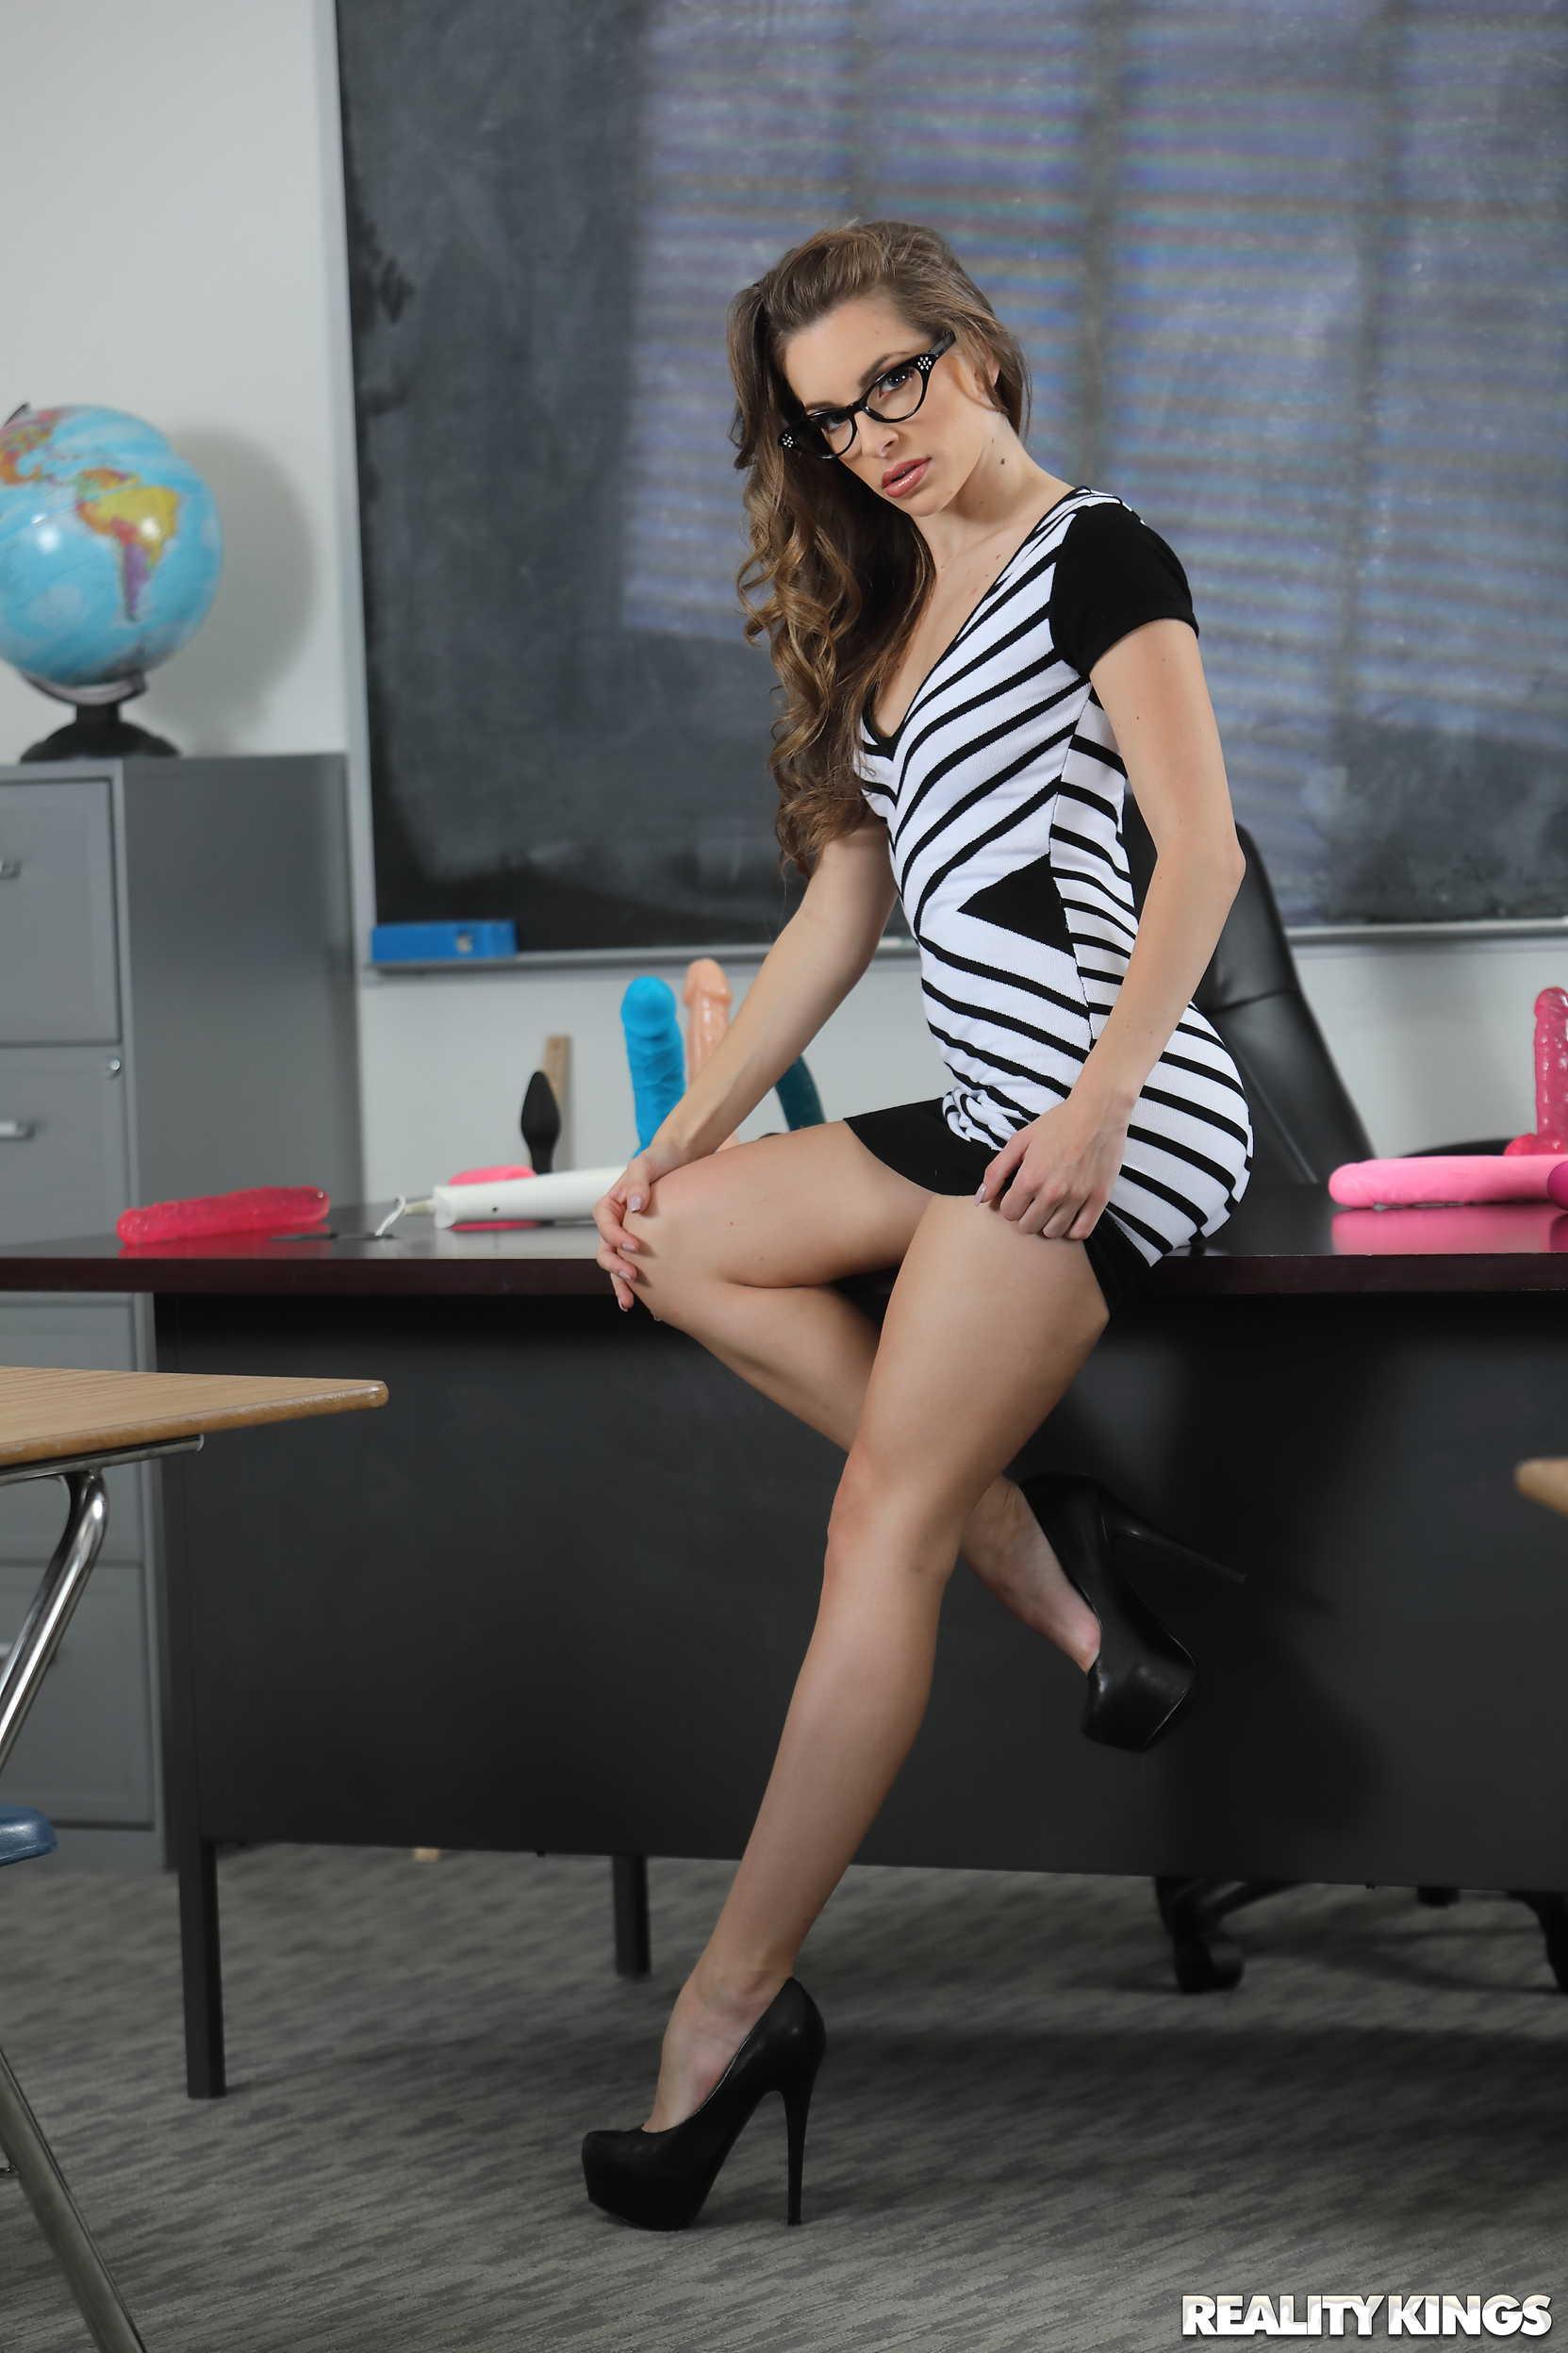 Reality Kings 'Slutty Sex Ed Teachers' starring Adriana Chechik (Photo 1)